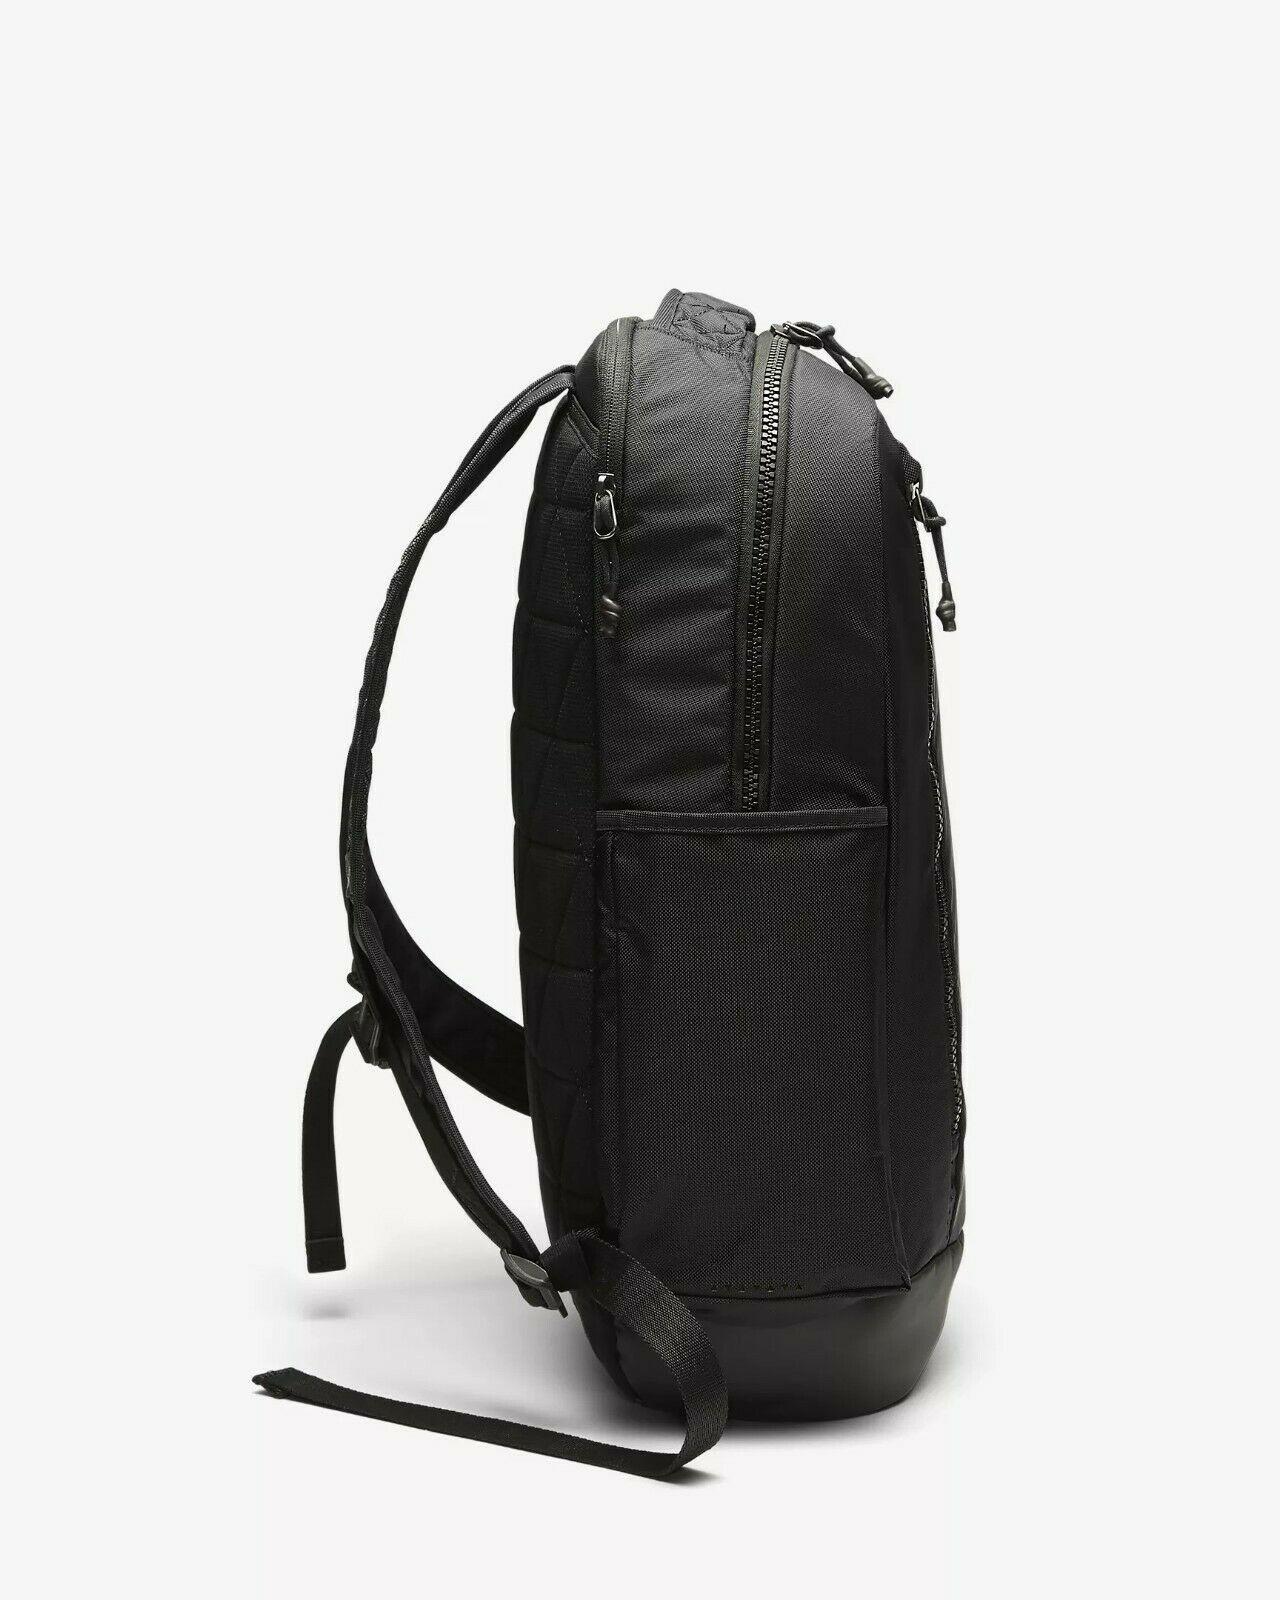 Nike Vapor Power 2.0 Training Backpack, BA5539 010 Black/Black/Black image 6